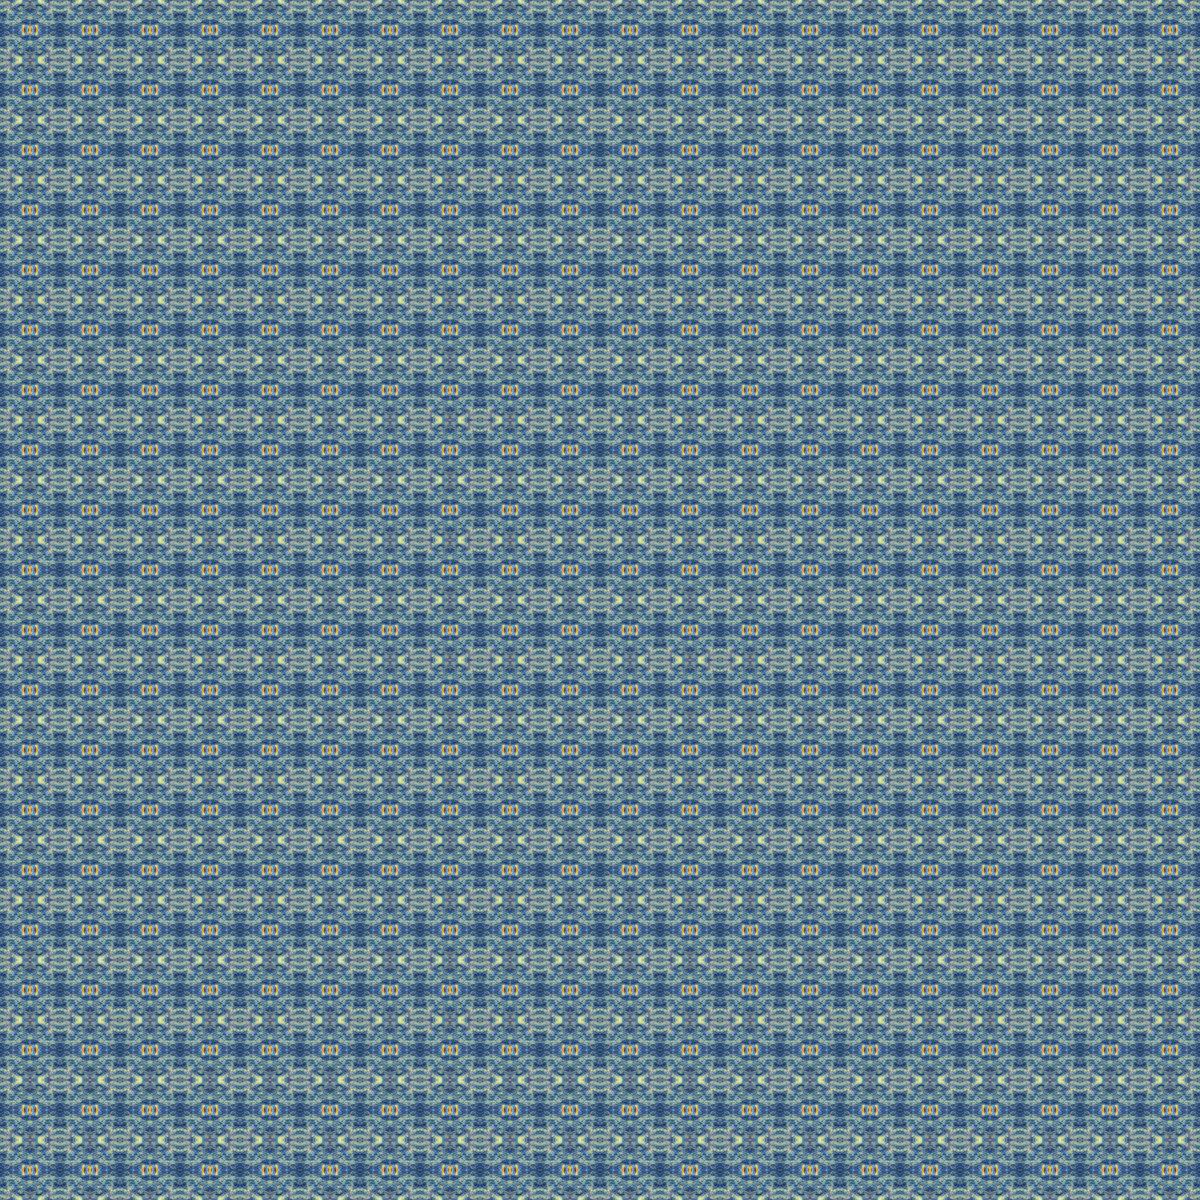 Паттерны и бесшовные текстуры бесплатно / Patterns and seamless textures for free, p_i_r_a_n_y_a - Геометрический паттерн - синий жаккард